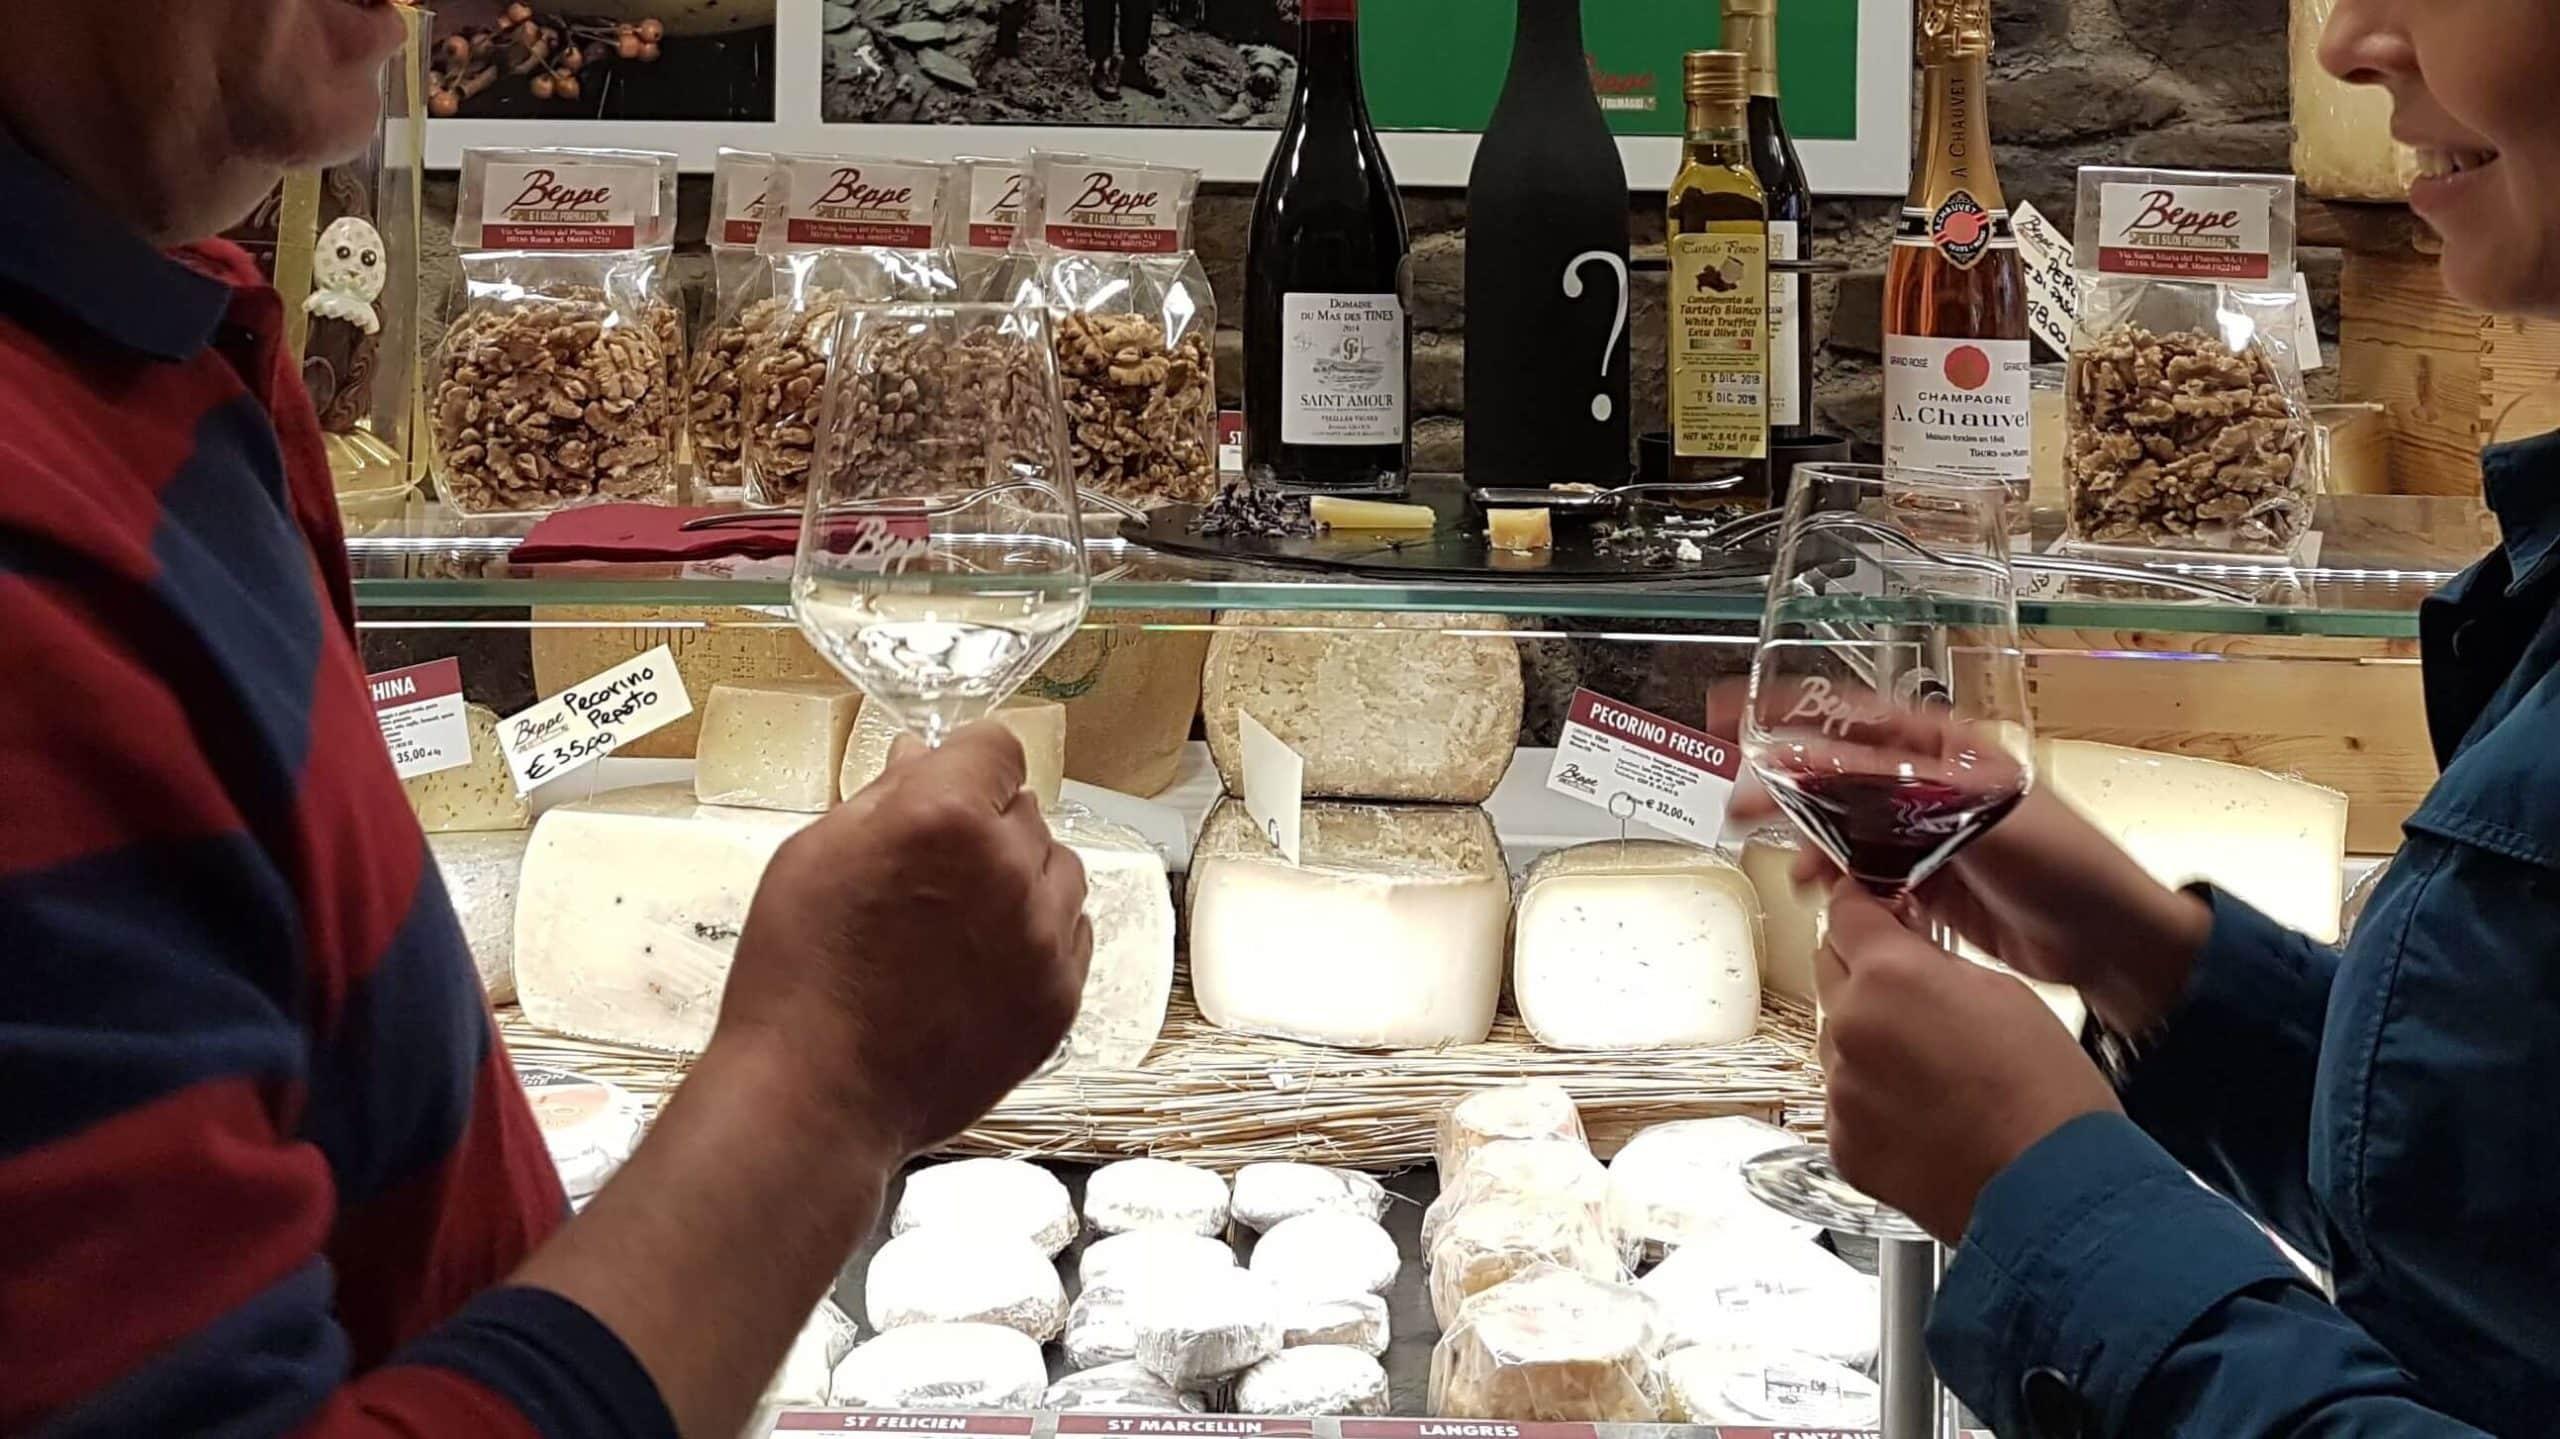 Tour Roma Gastronomica degustacion vino y quesos